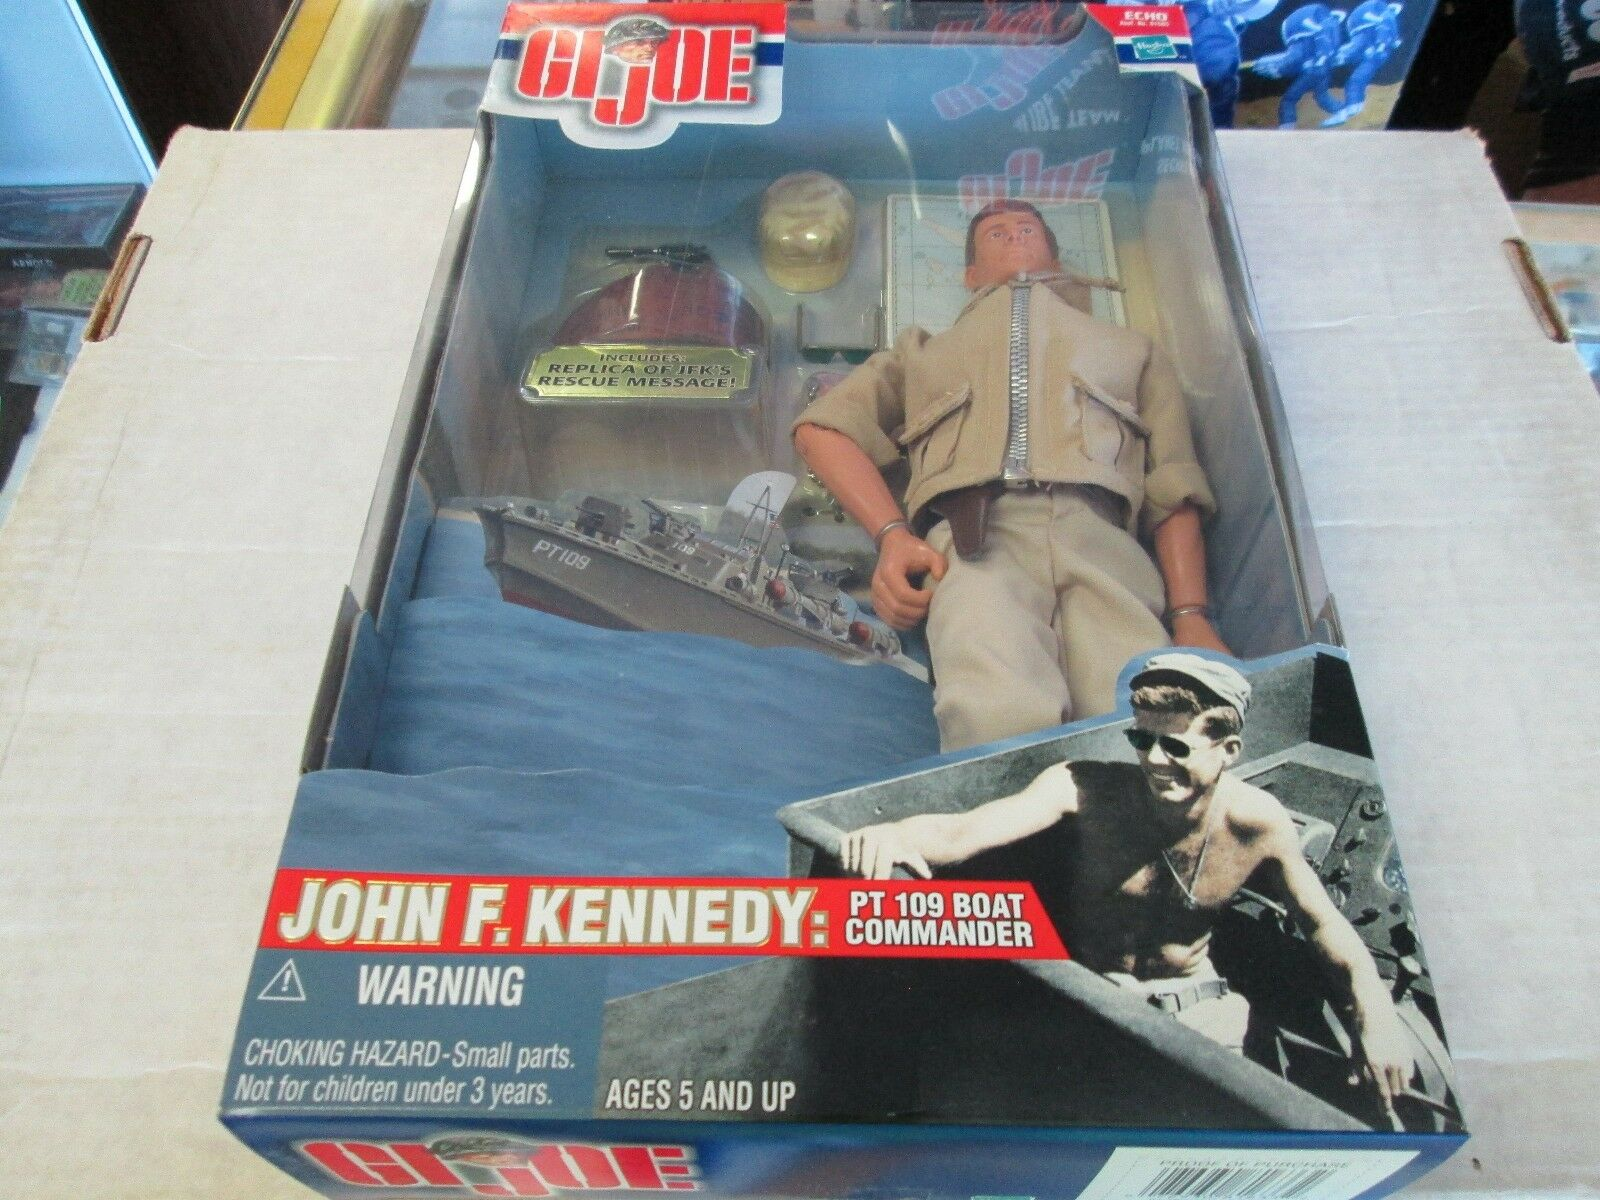 MIB GI Joe 12  John F. Kennedy PT 109 Boat Commander W  Replica Rescue MSG.